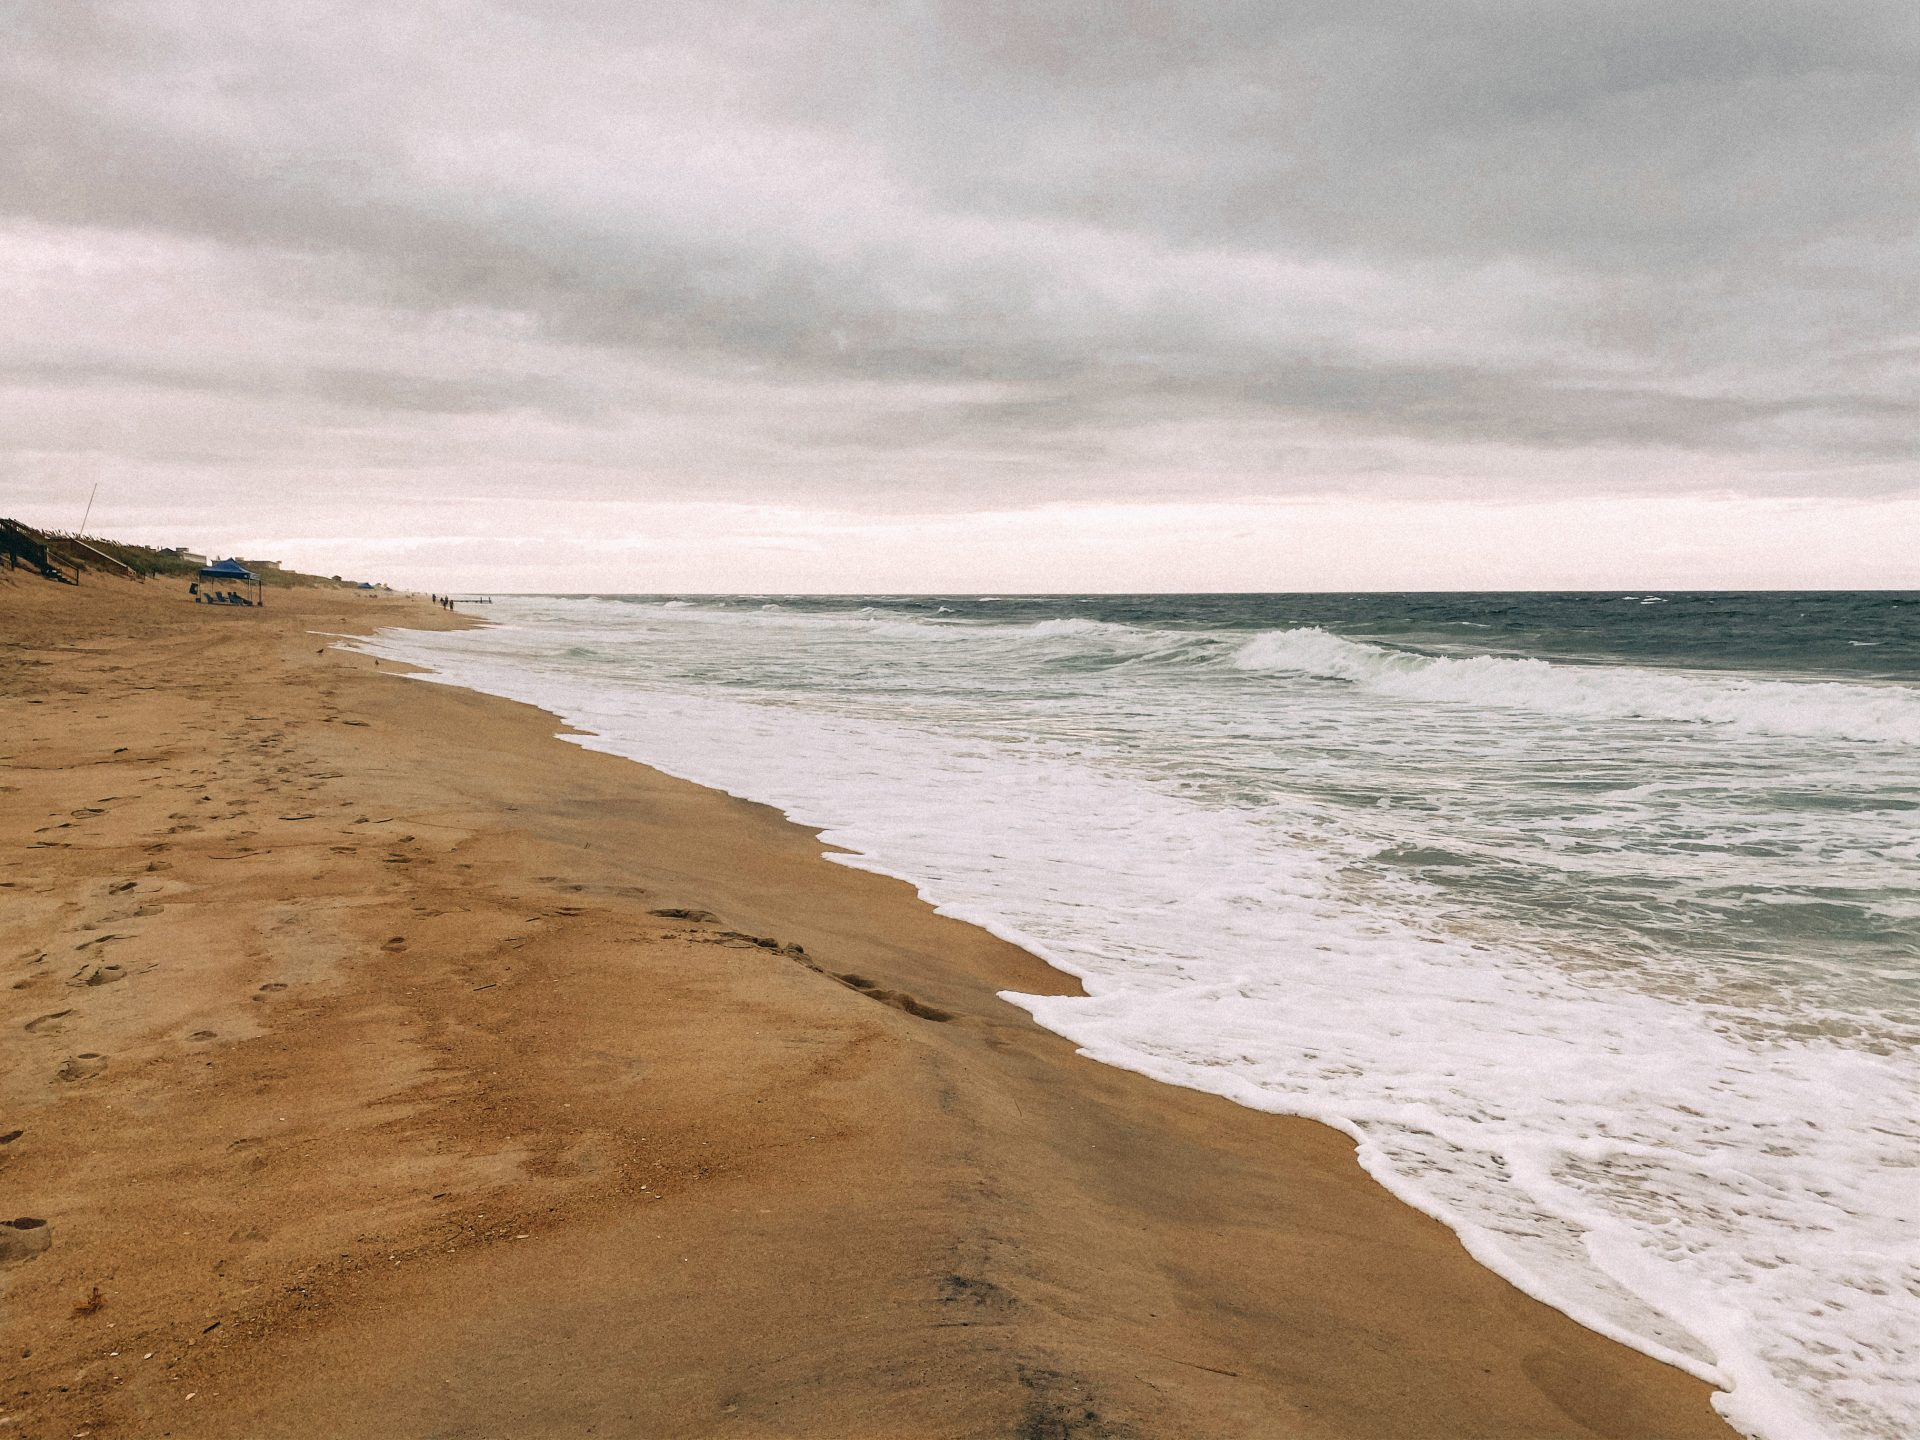 Moody skies over a damp beach and rough ocean water